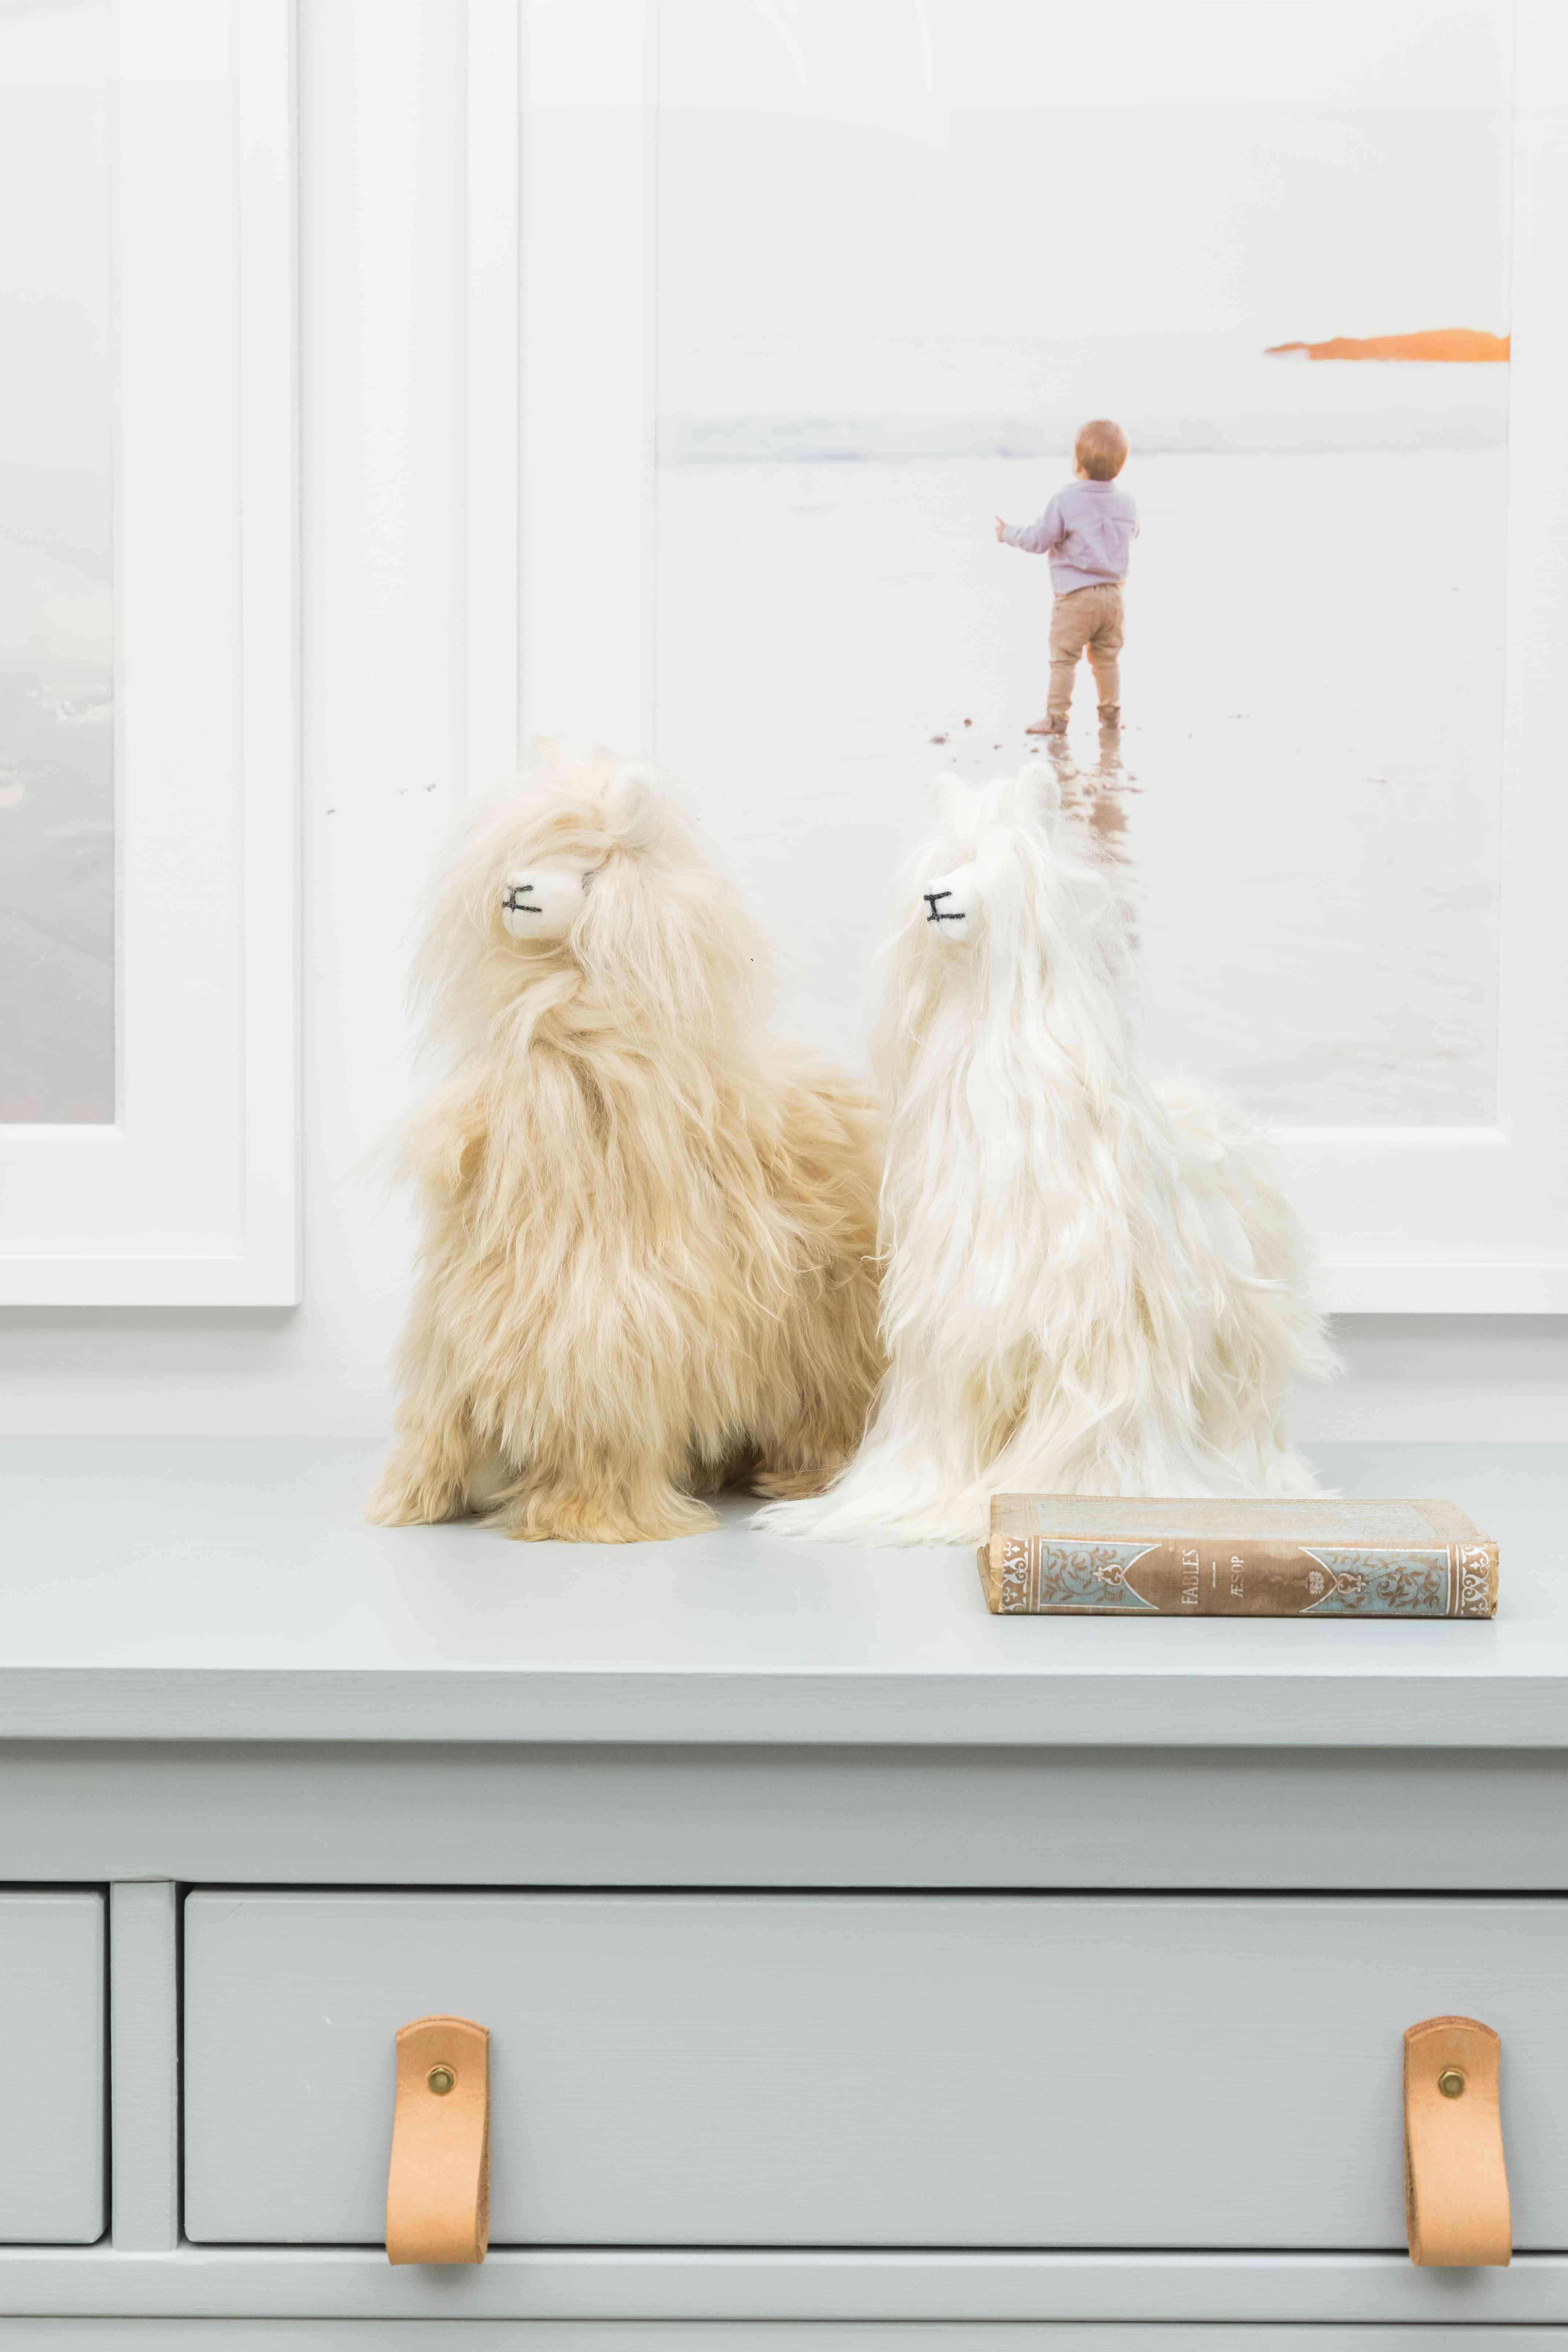 Two llama stuffed animals on dresser.